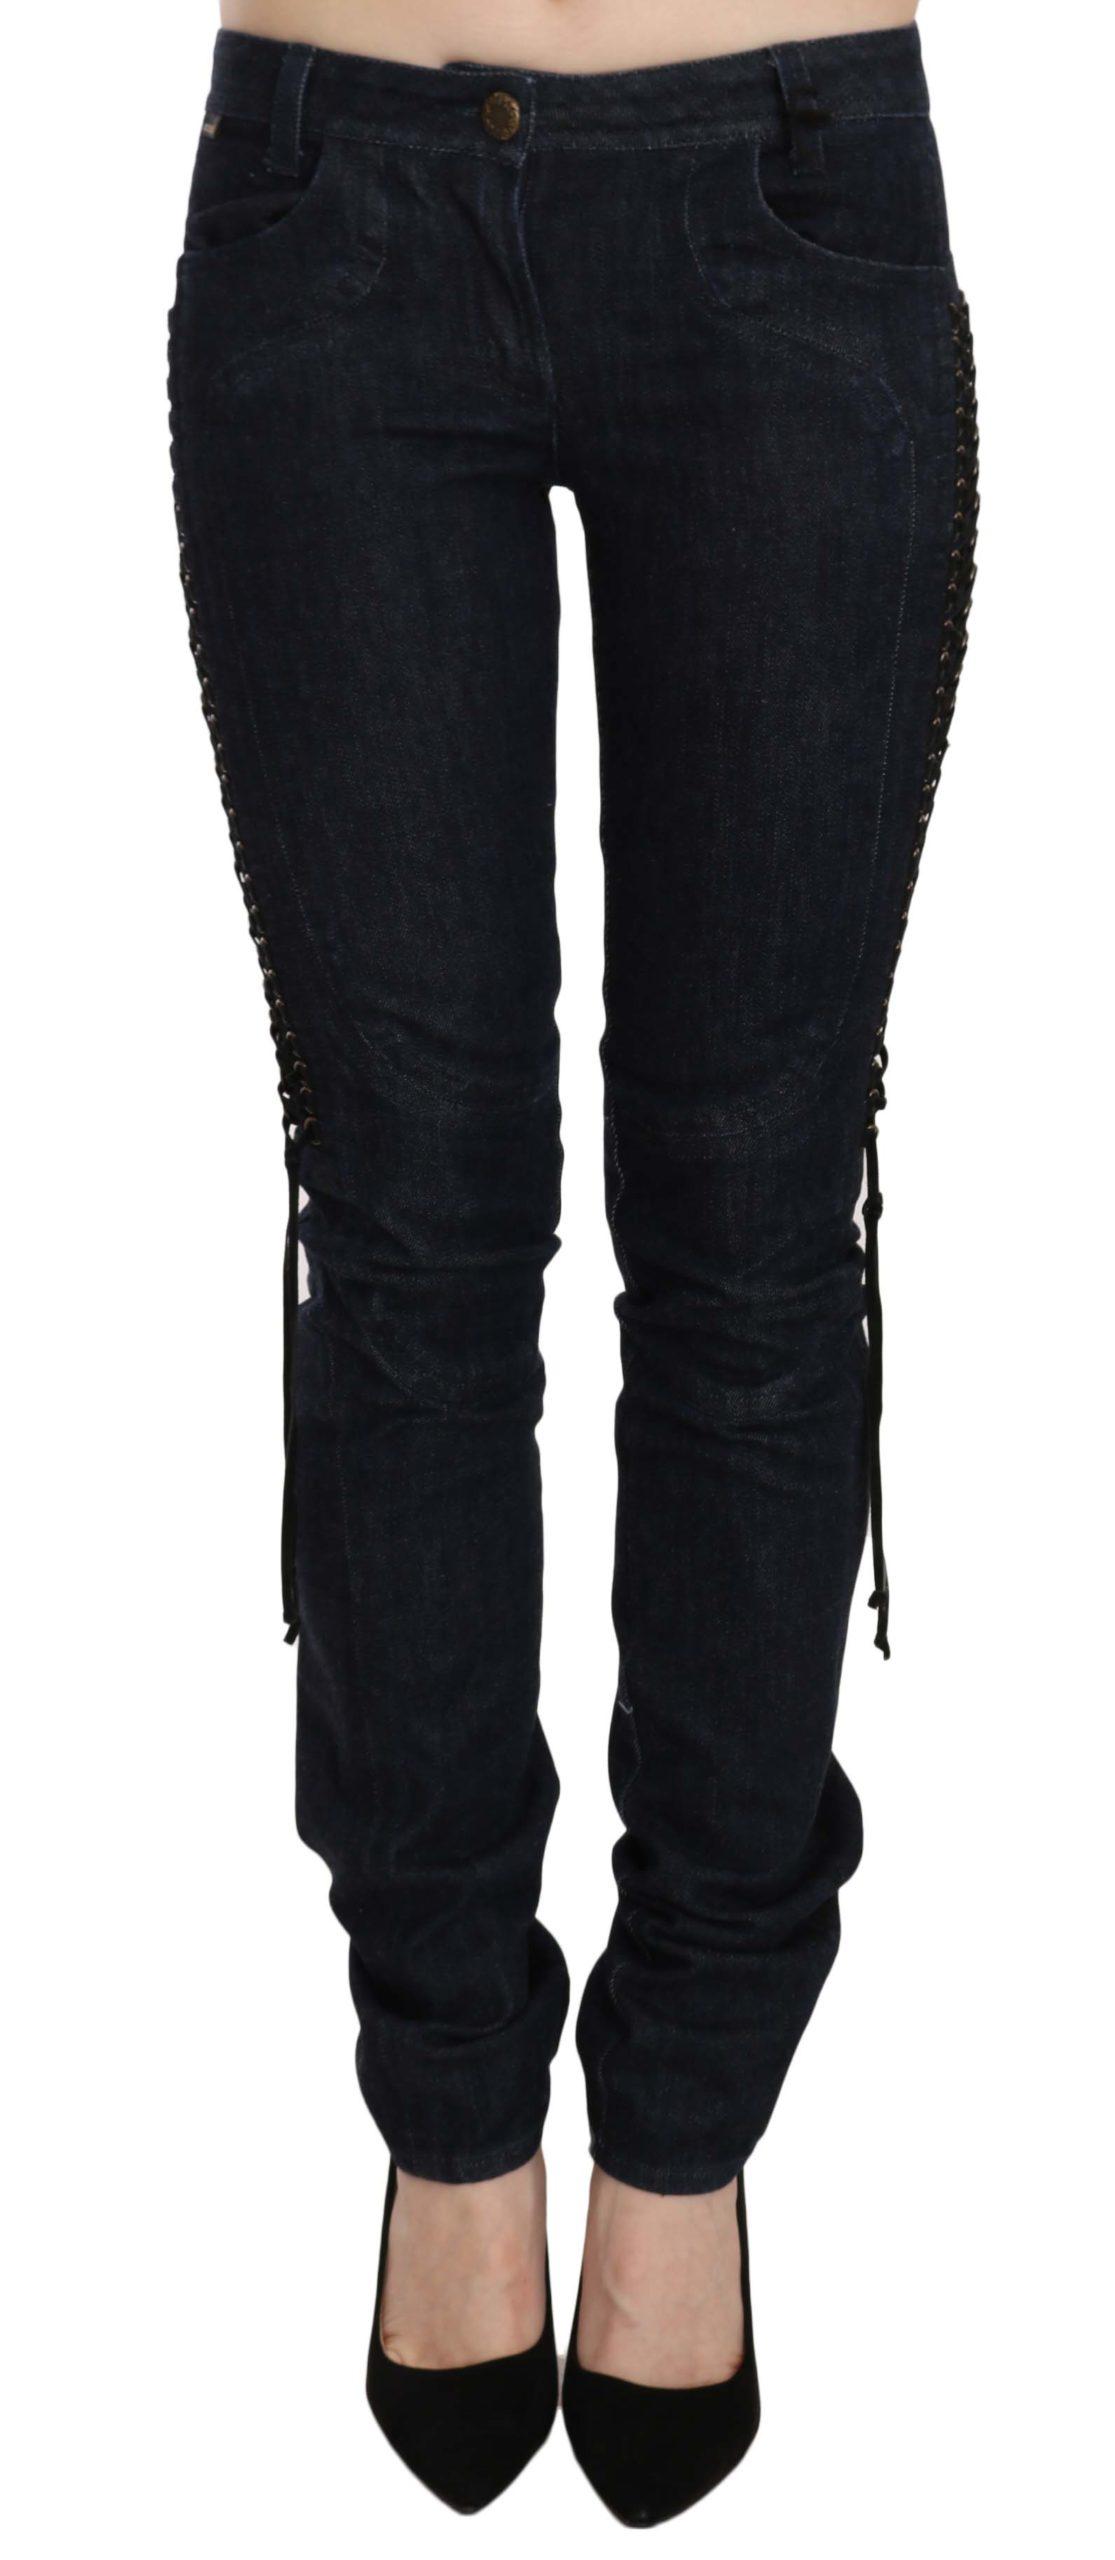 Just Cavalli Women's Low Waist Skinny Trouser Black PAN70321 - W26